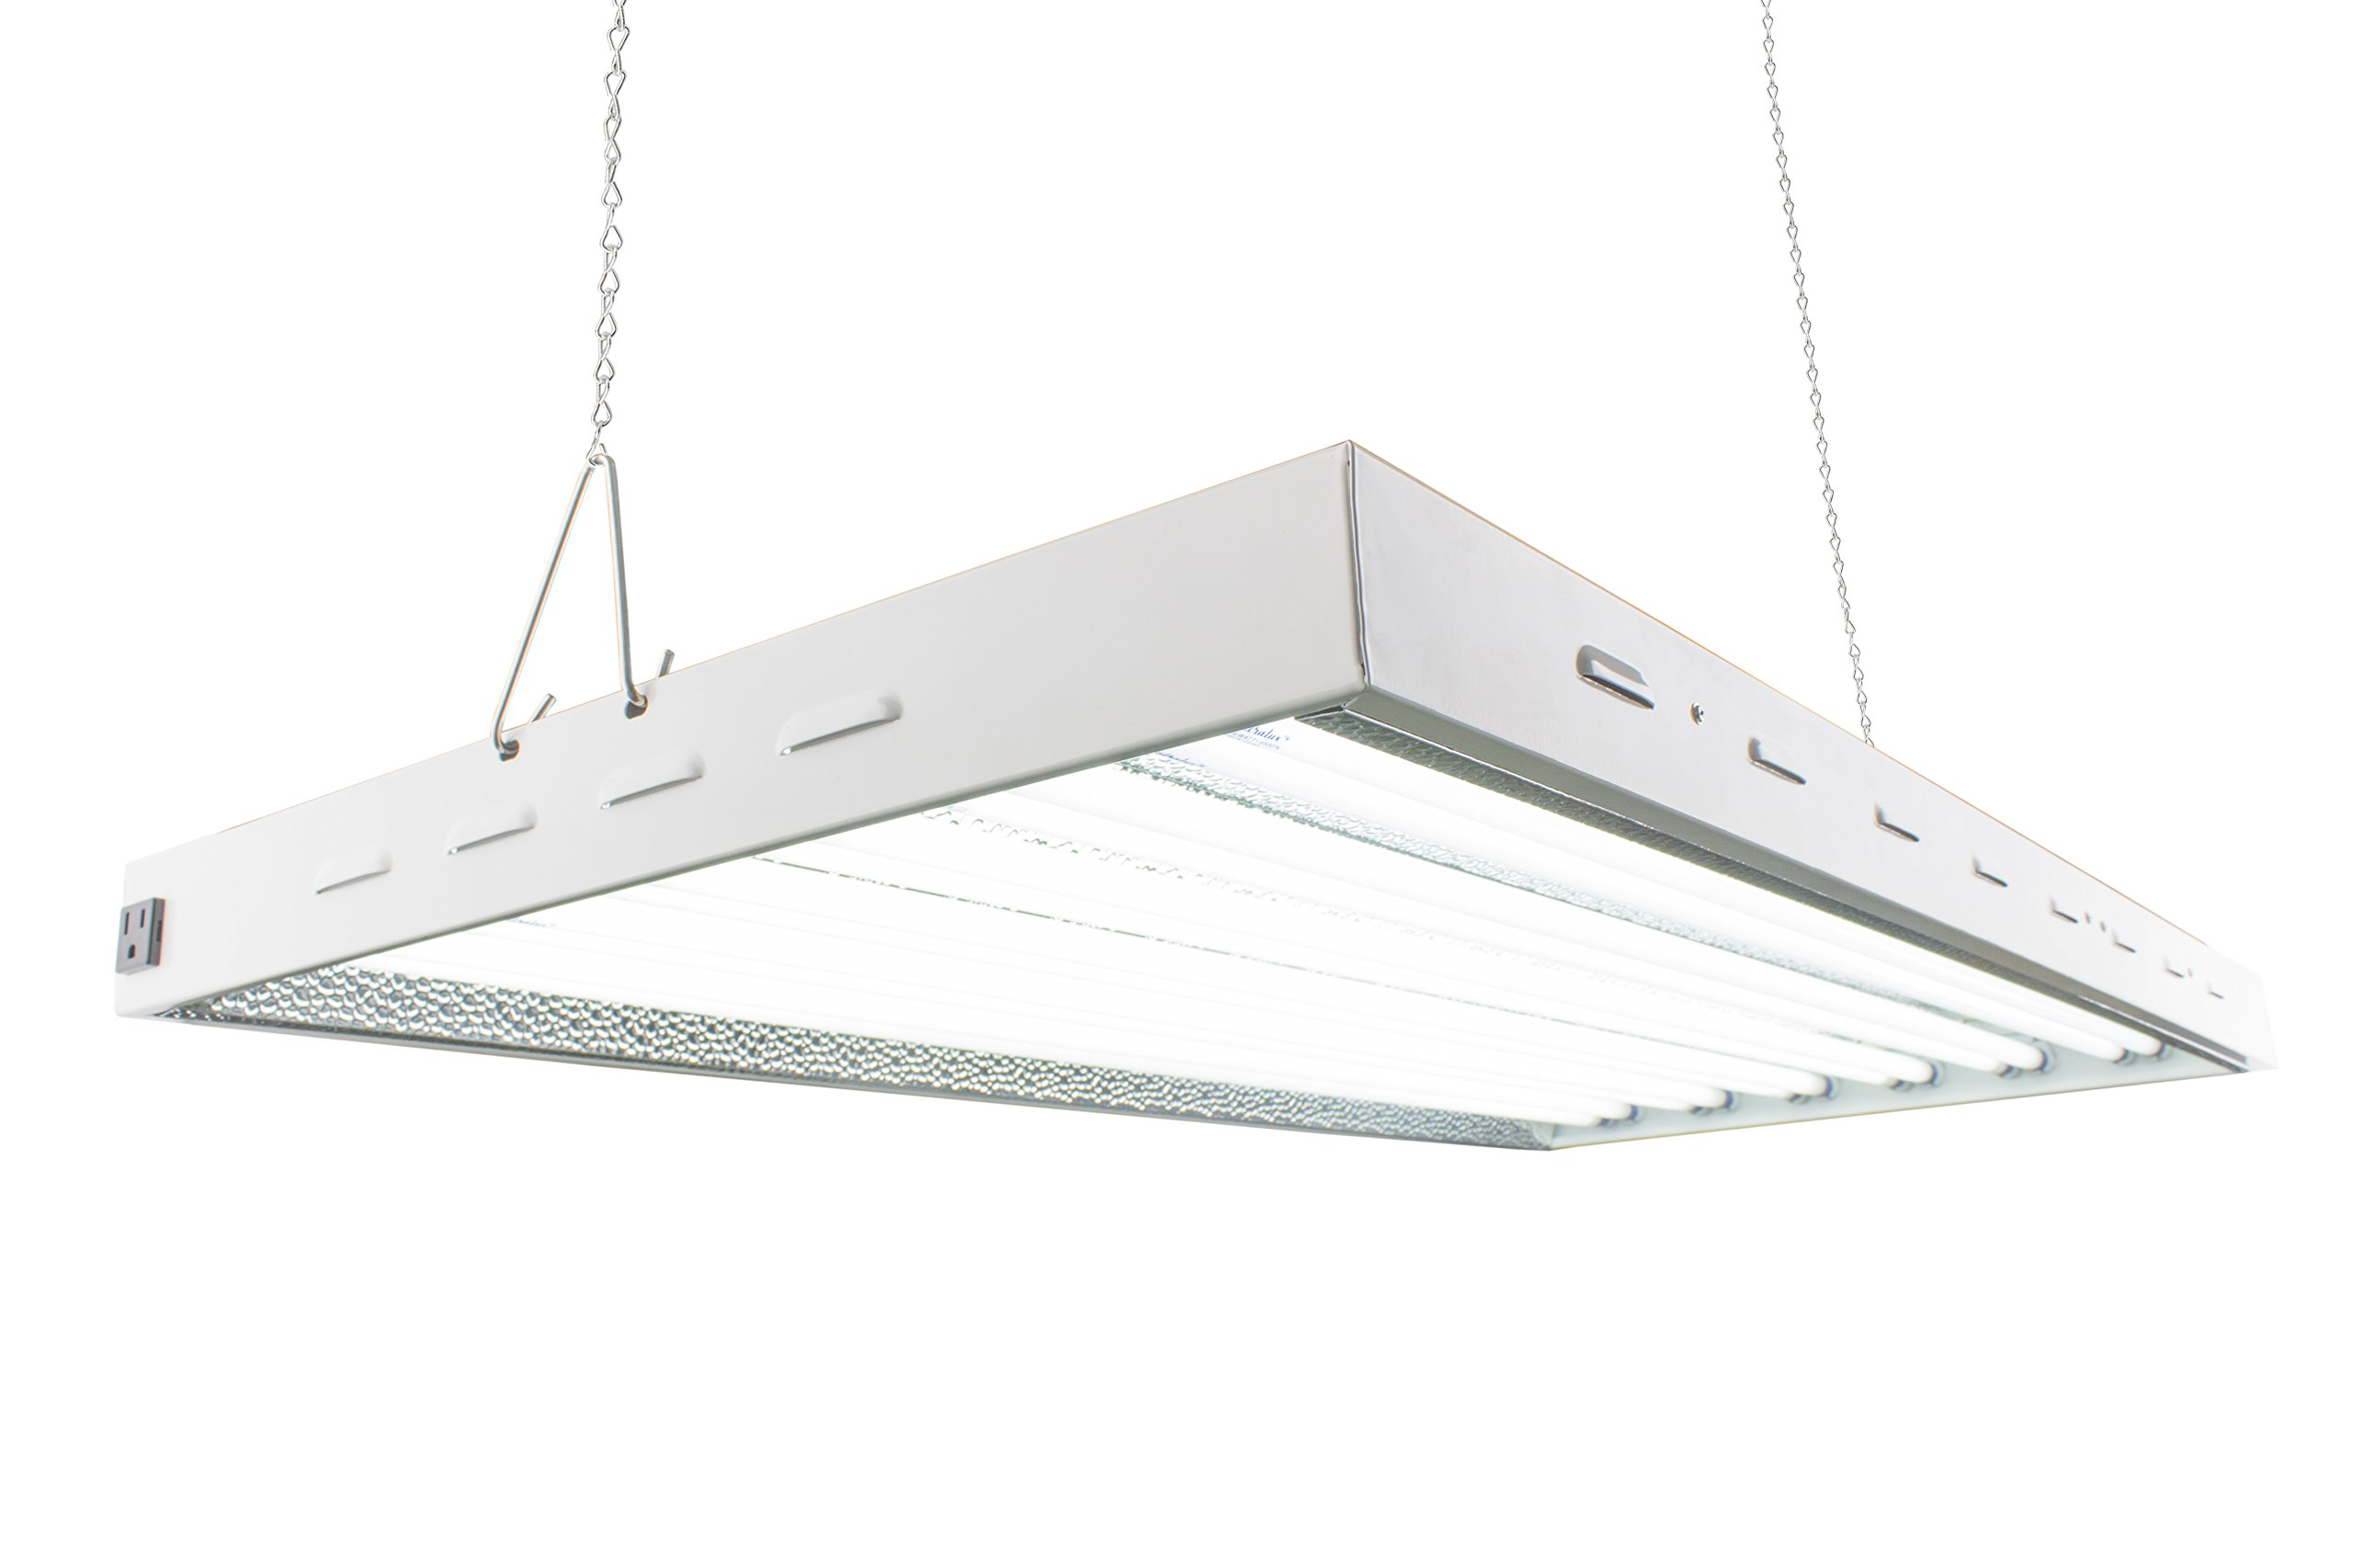 T5 HO Steel Grow Light | 4 FT 12 Lamps | DL8412ST Fluorescent Hydroponic Indoor Fixture | Veg Bulbs by DuroLux